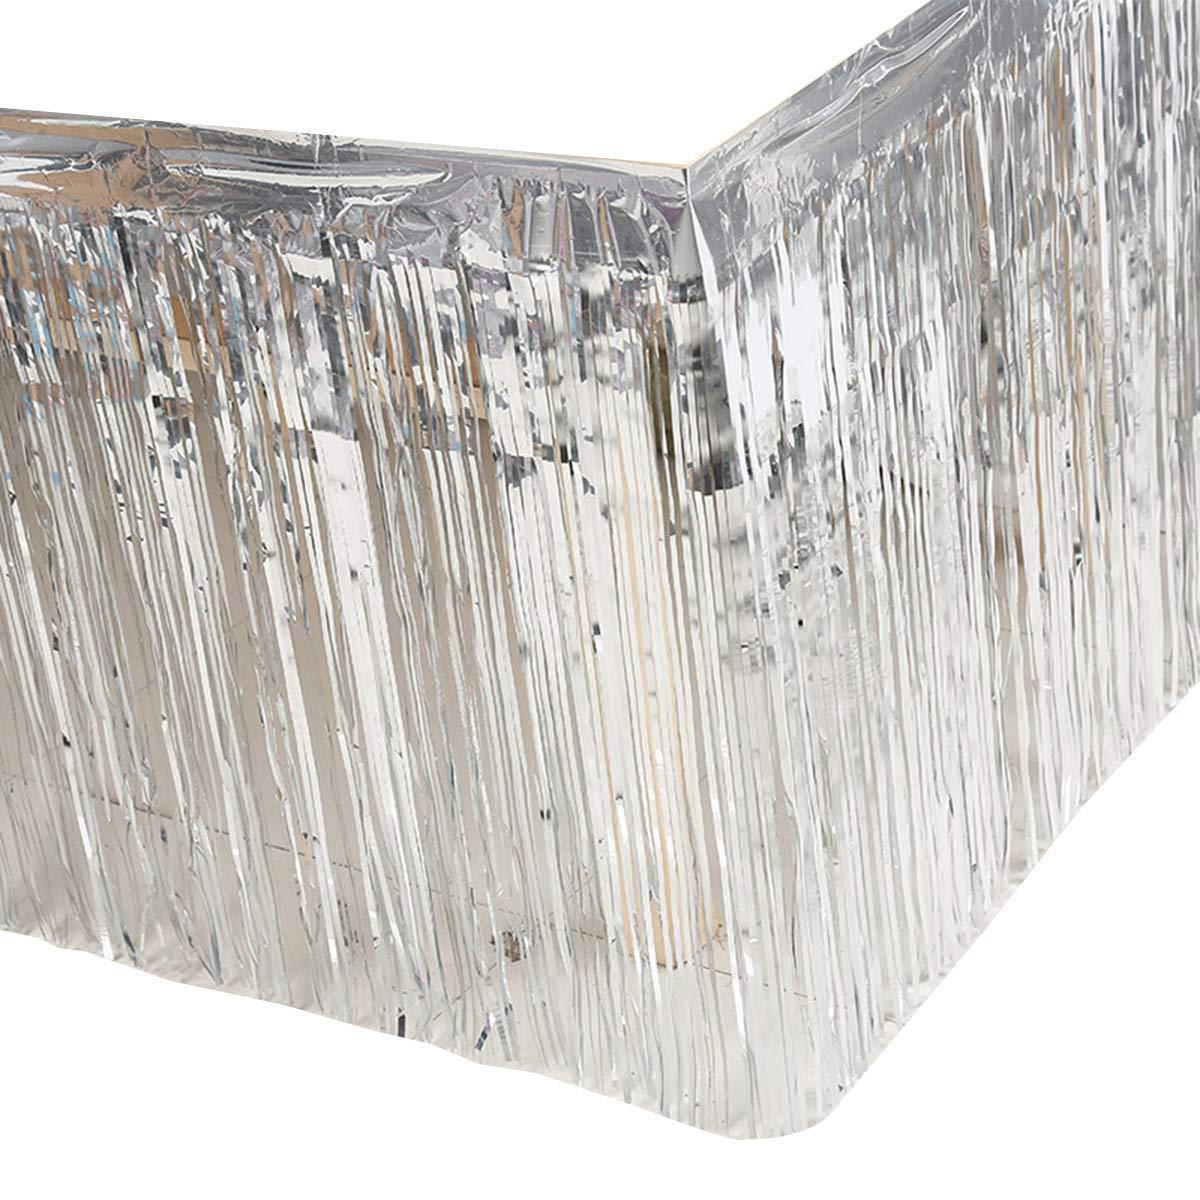 PUZINE 2pack Metallic Metallic Foil Fringe Table Skirt 2pack, Pink